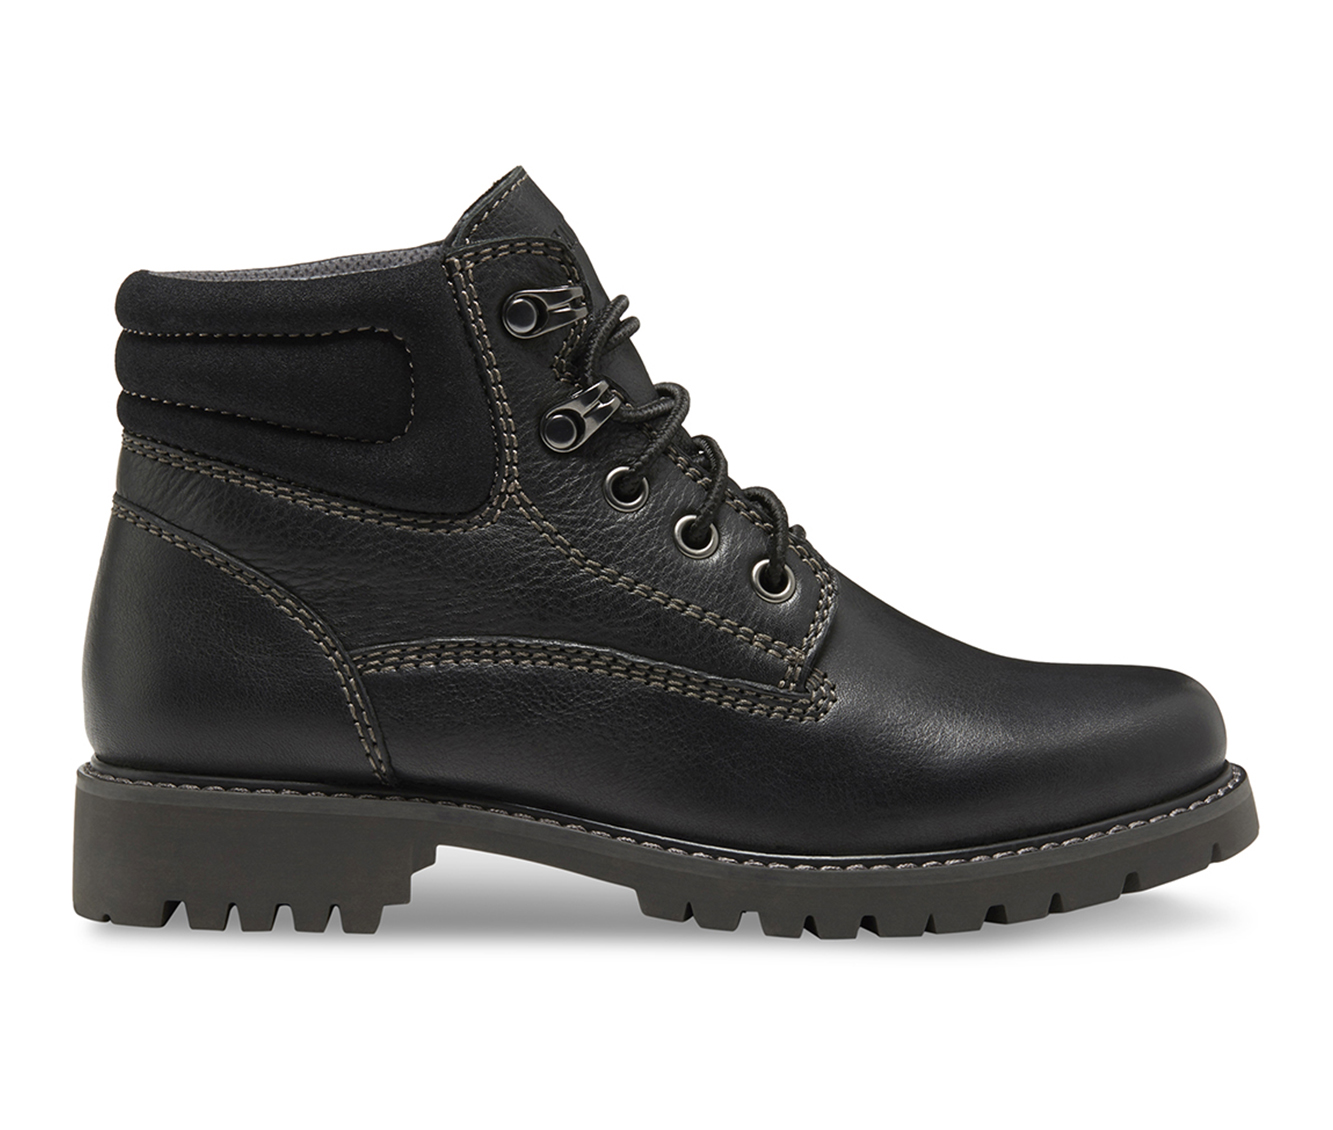 Eastland Edith Women's Boot (Black Leather)